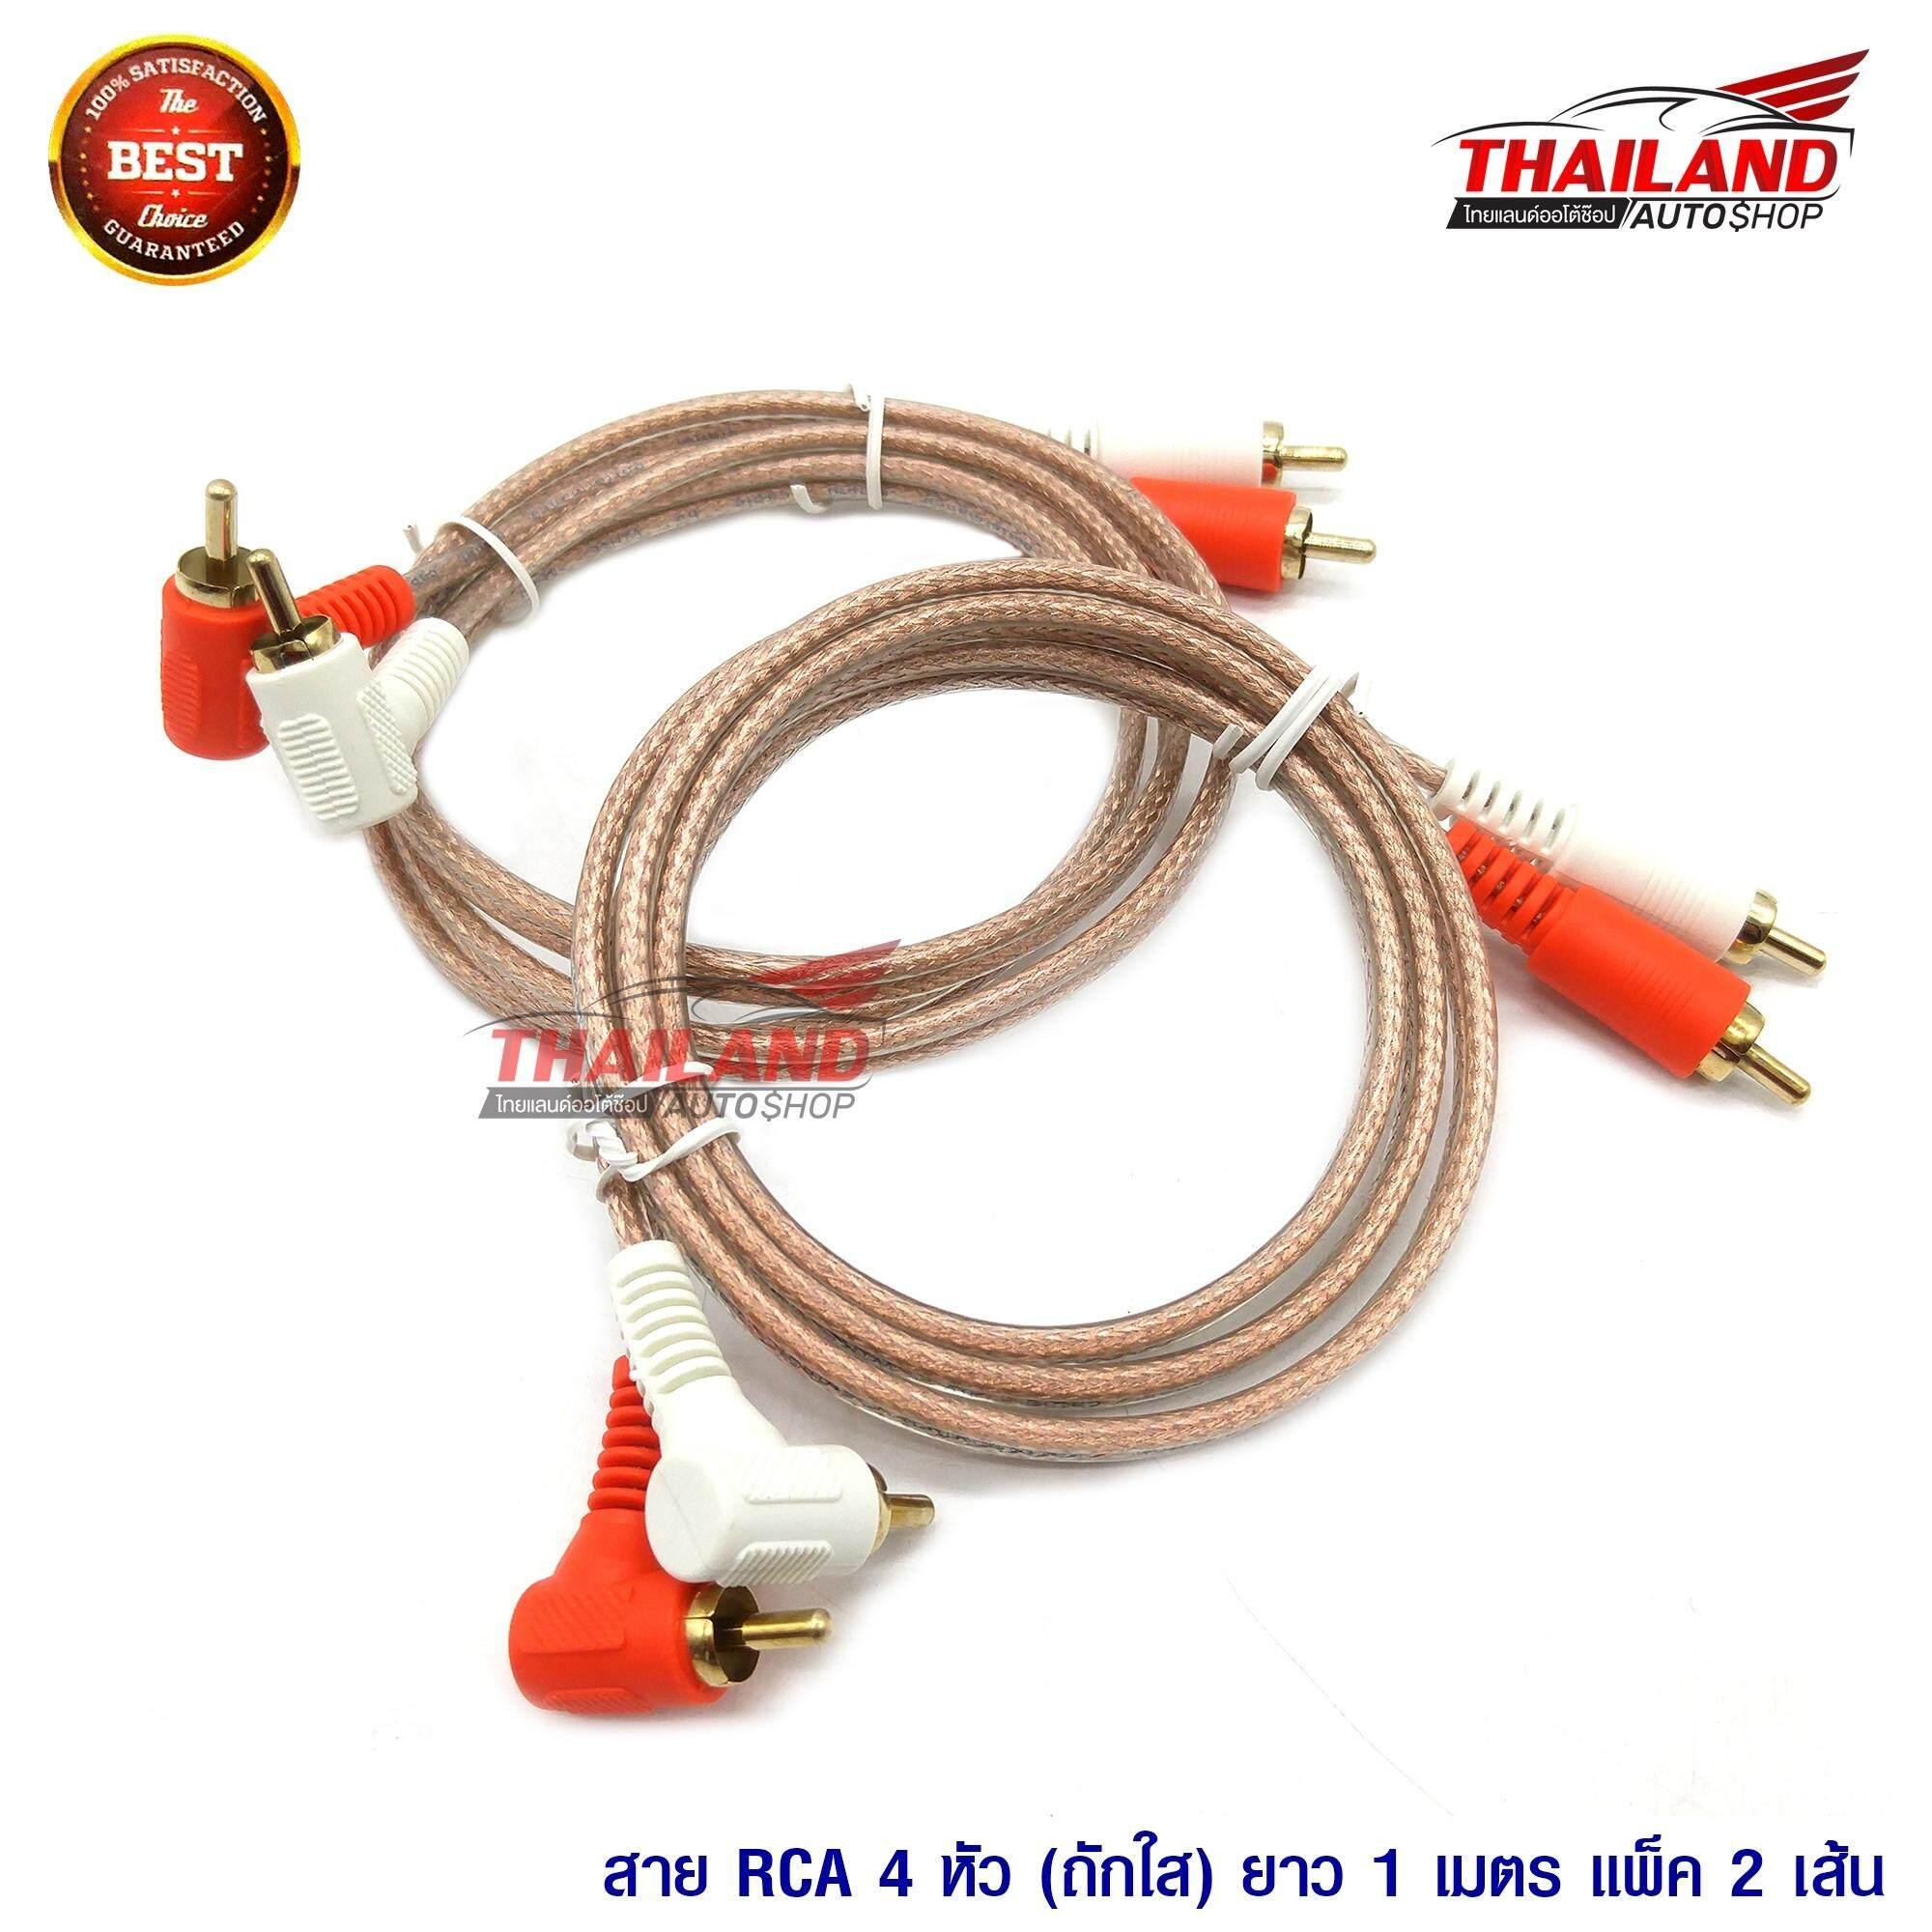 Thailand สาย Rca 4 หัว (ถักใส)  1 เมตร แพ็ค 2 เส้น.